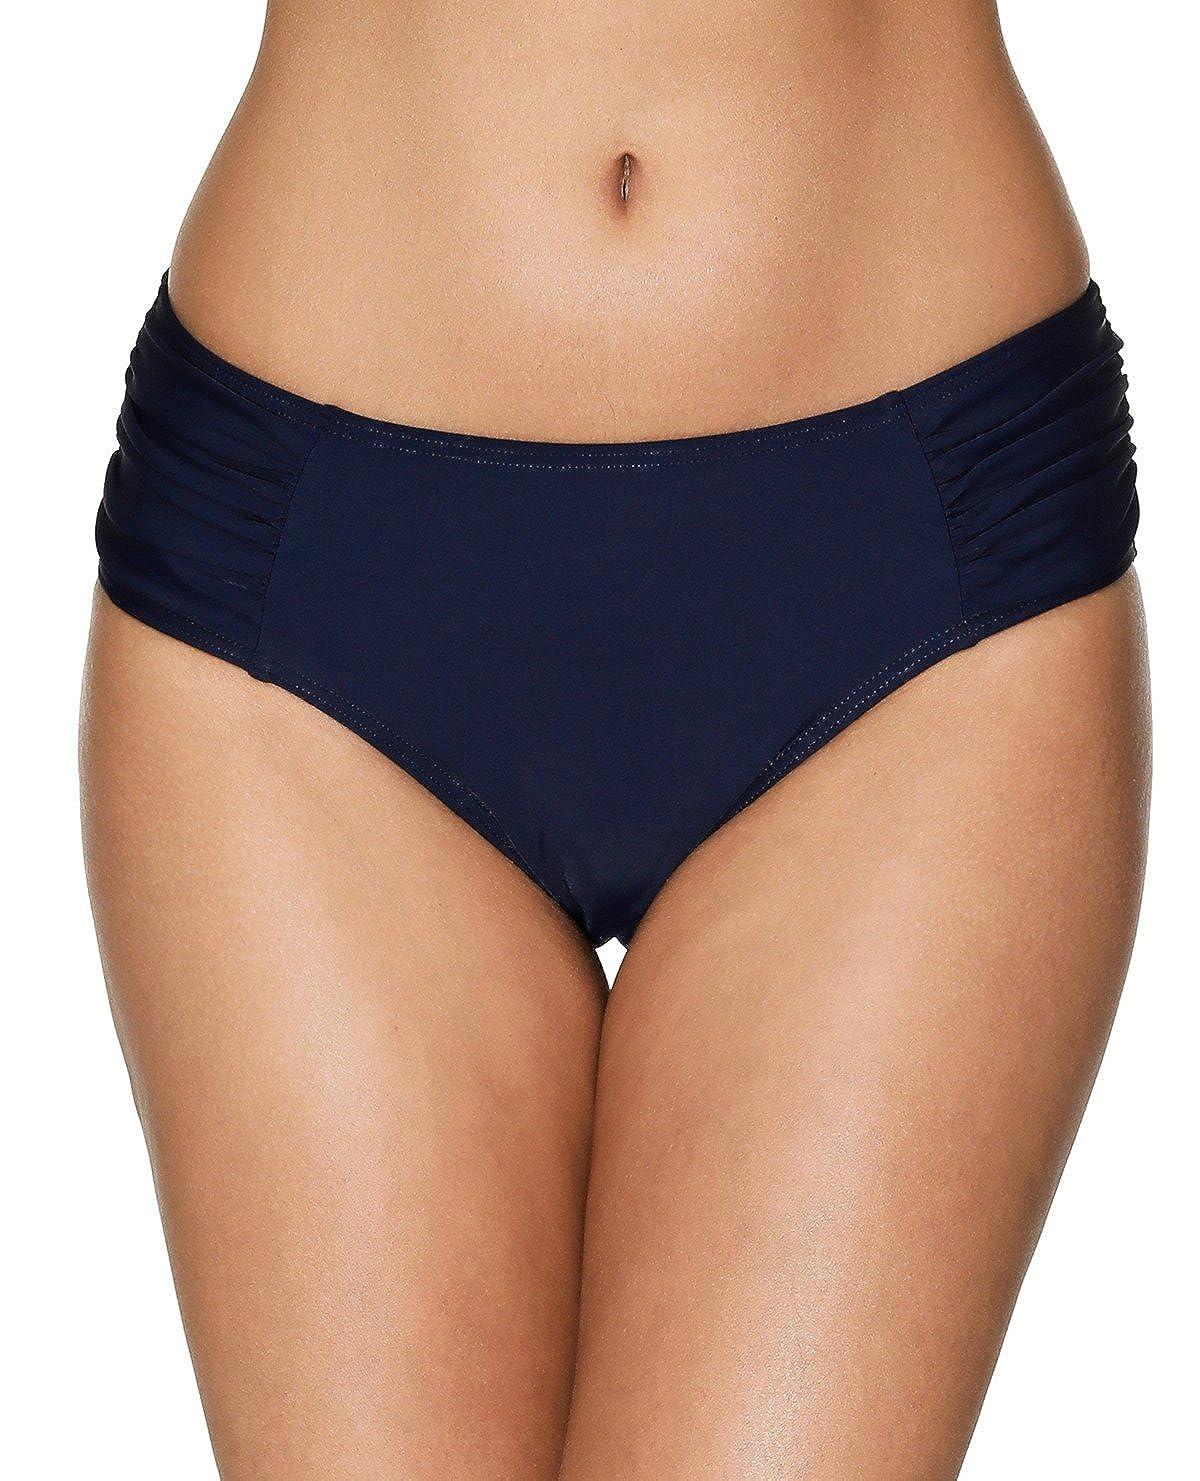 Full coverage bikini swimsuit share your